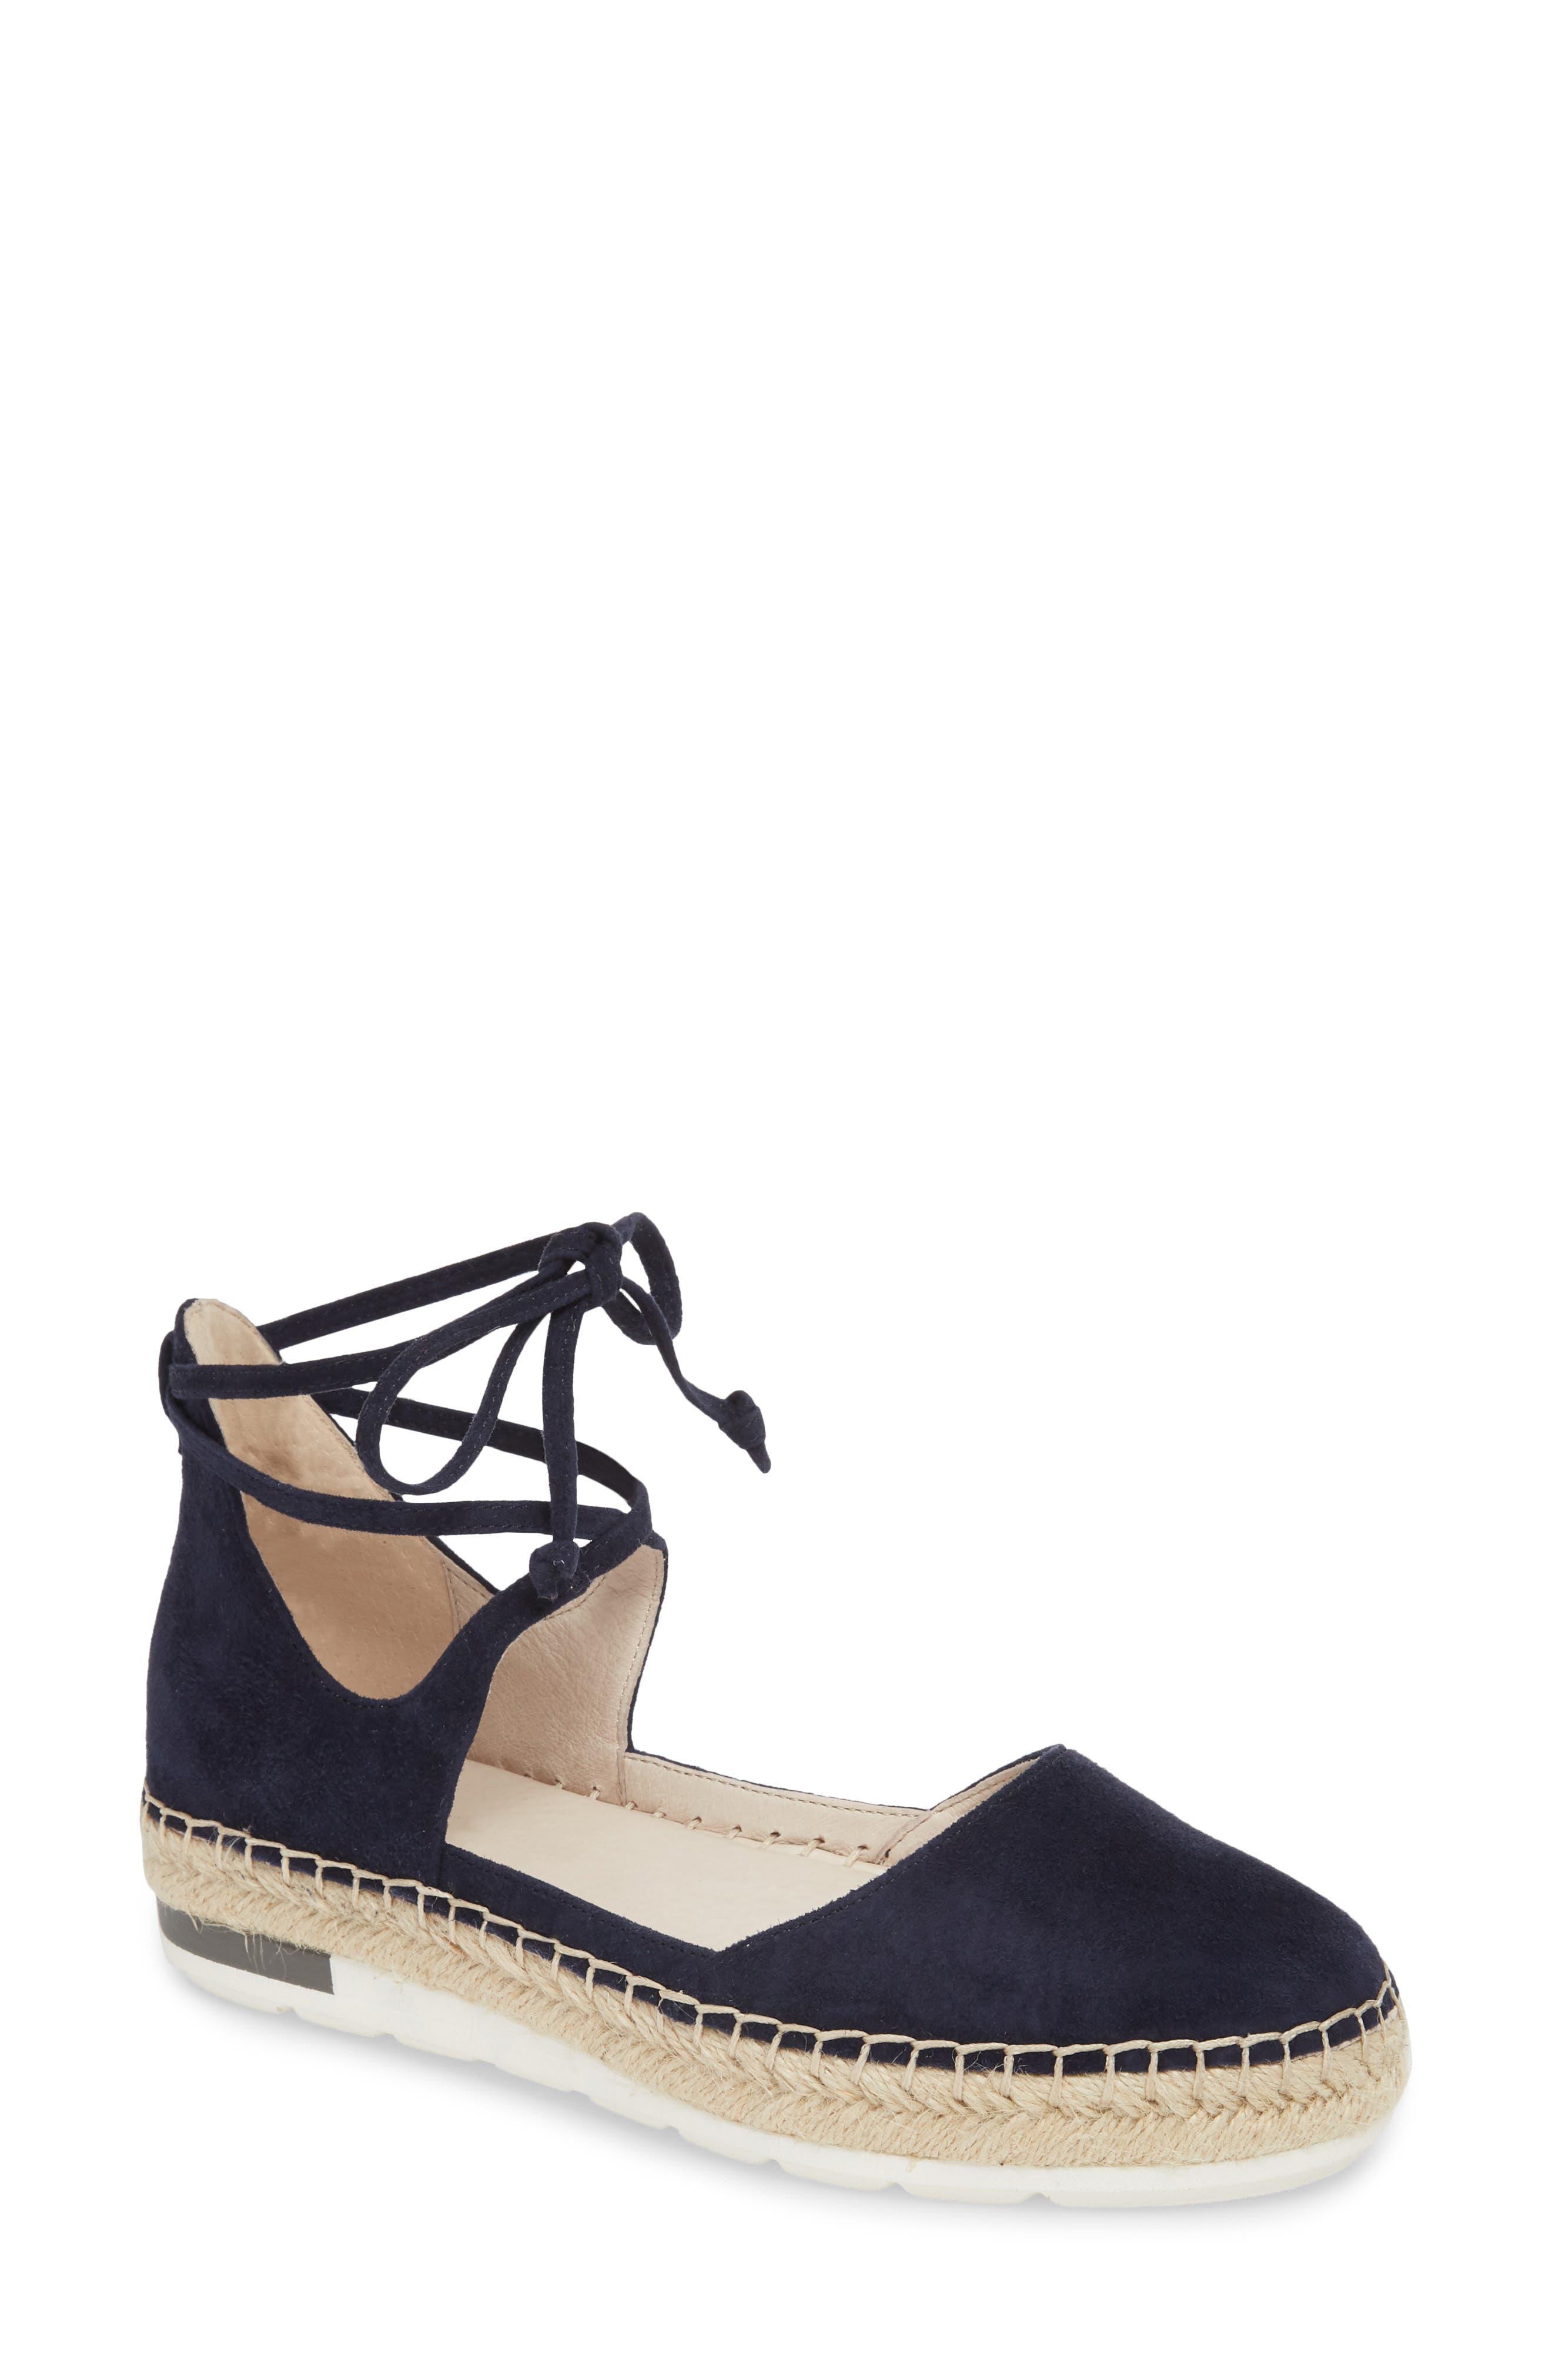 Leena Ankle Strap Sandal,                         Main,                         color, Navy Suede